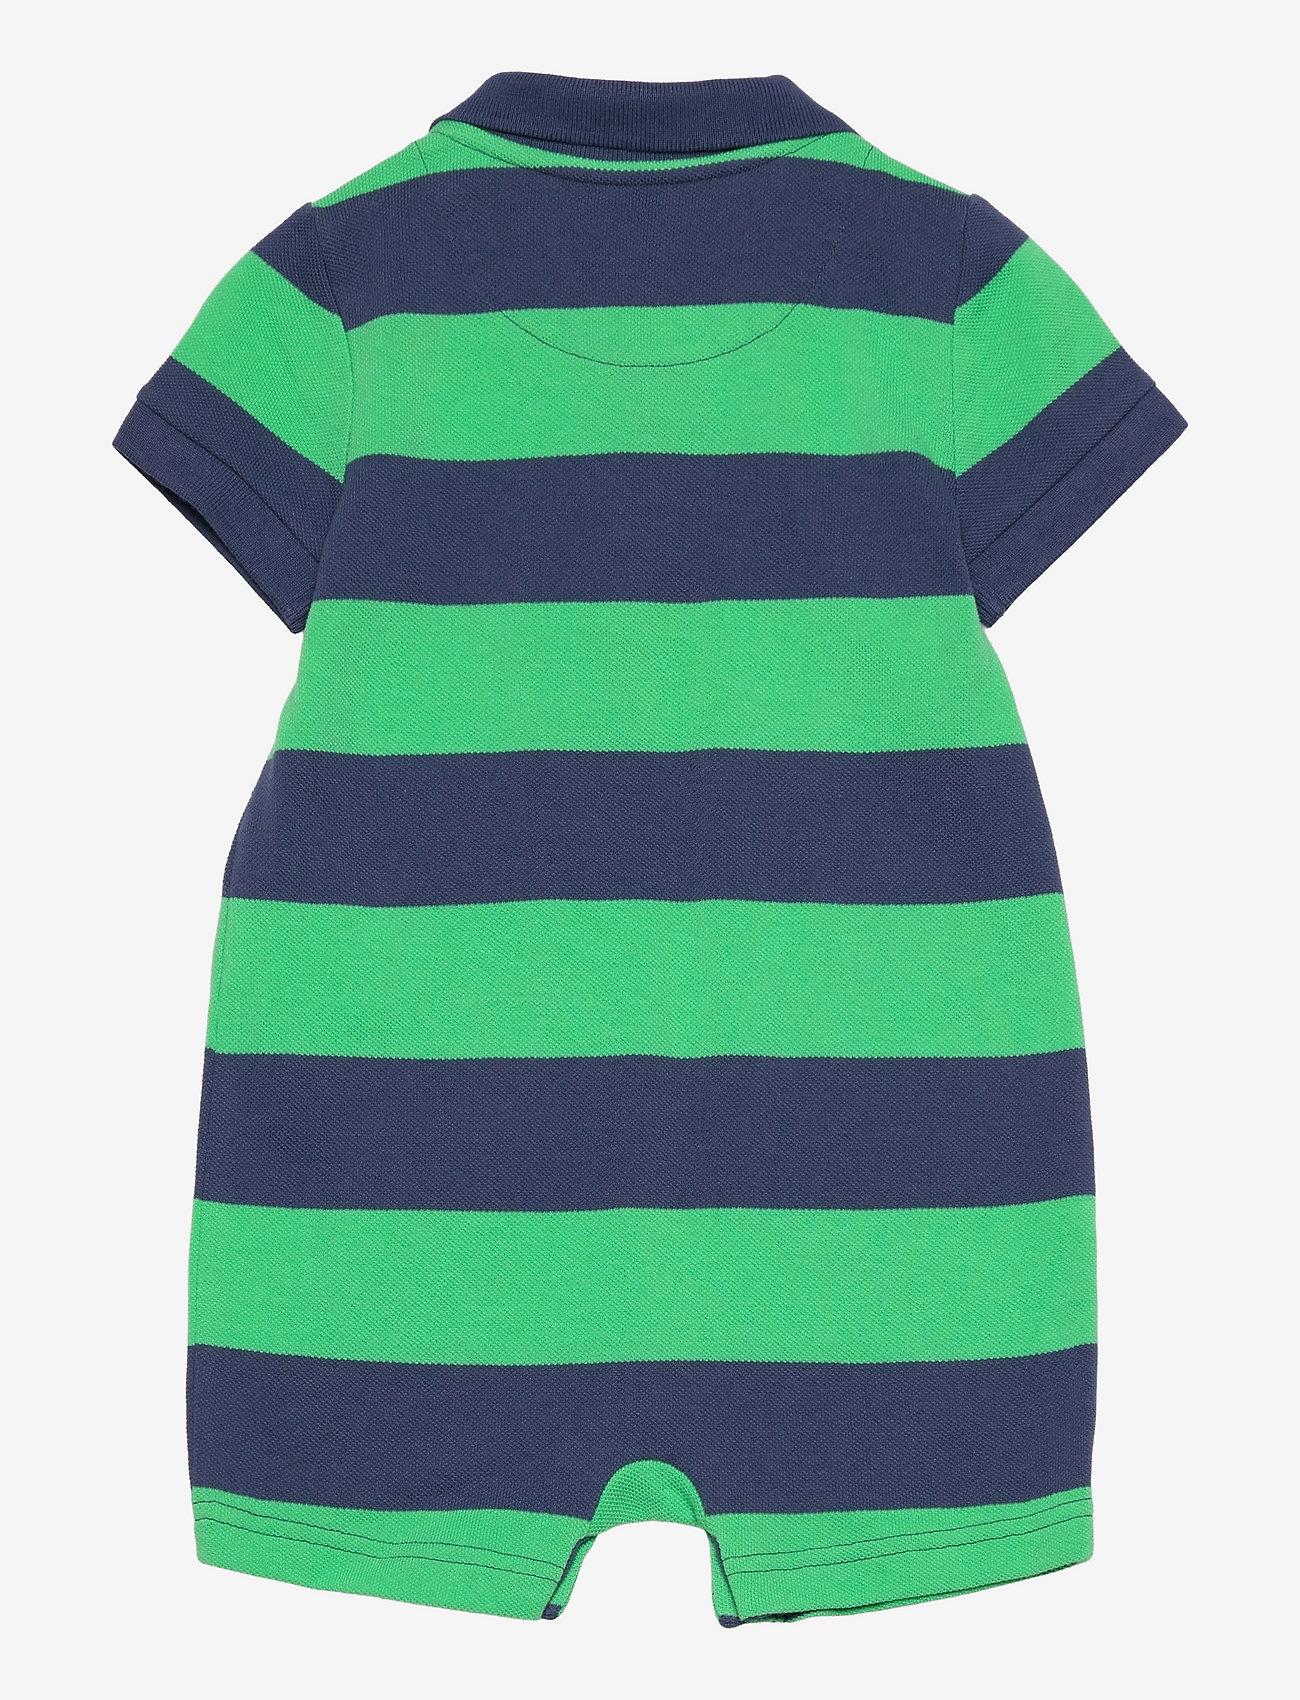 GAP - Baby Polo Shorty One-Piece - kurzärmelig - parrot green 385 - 1